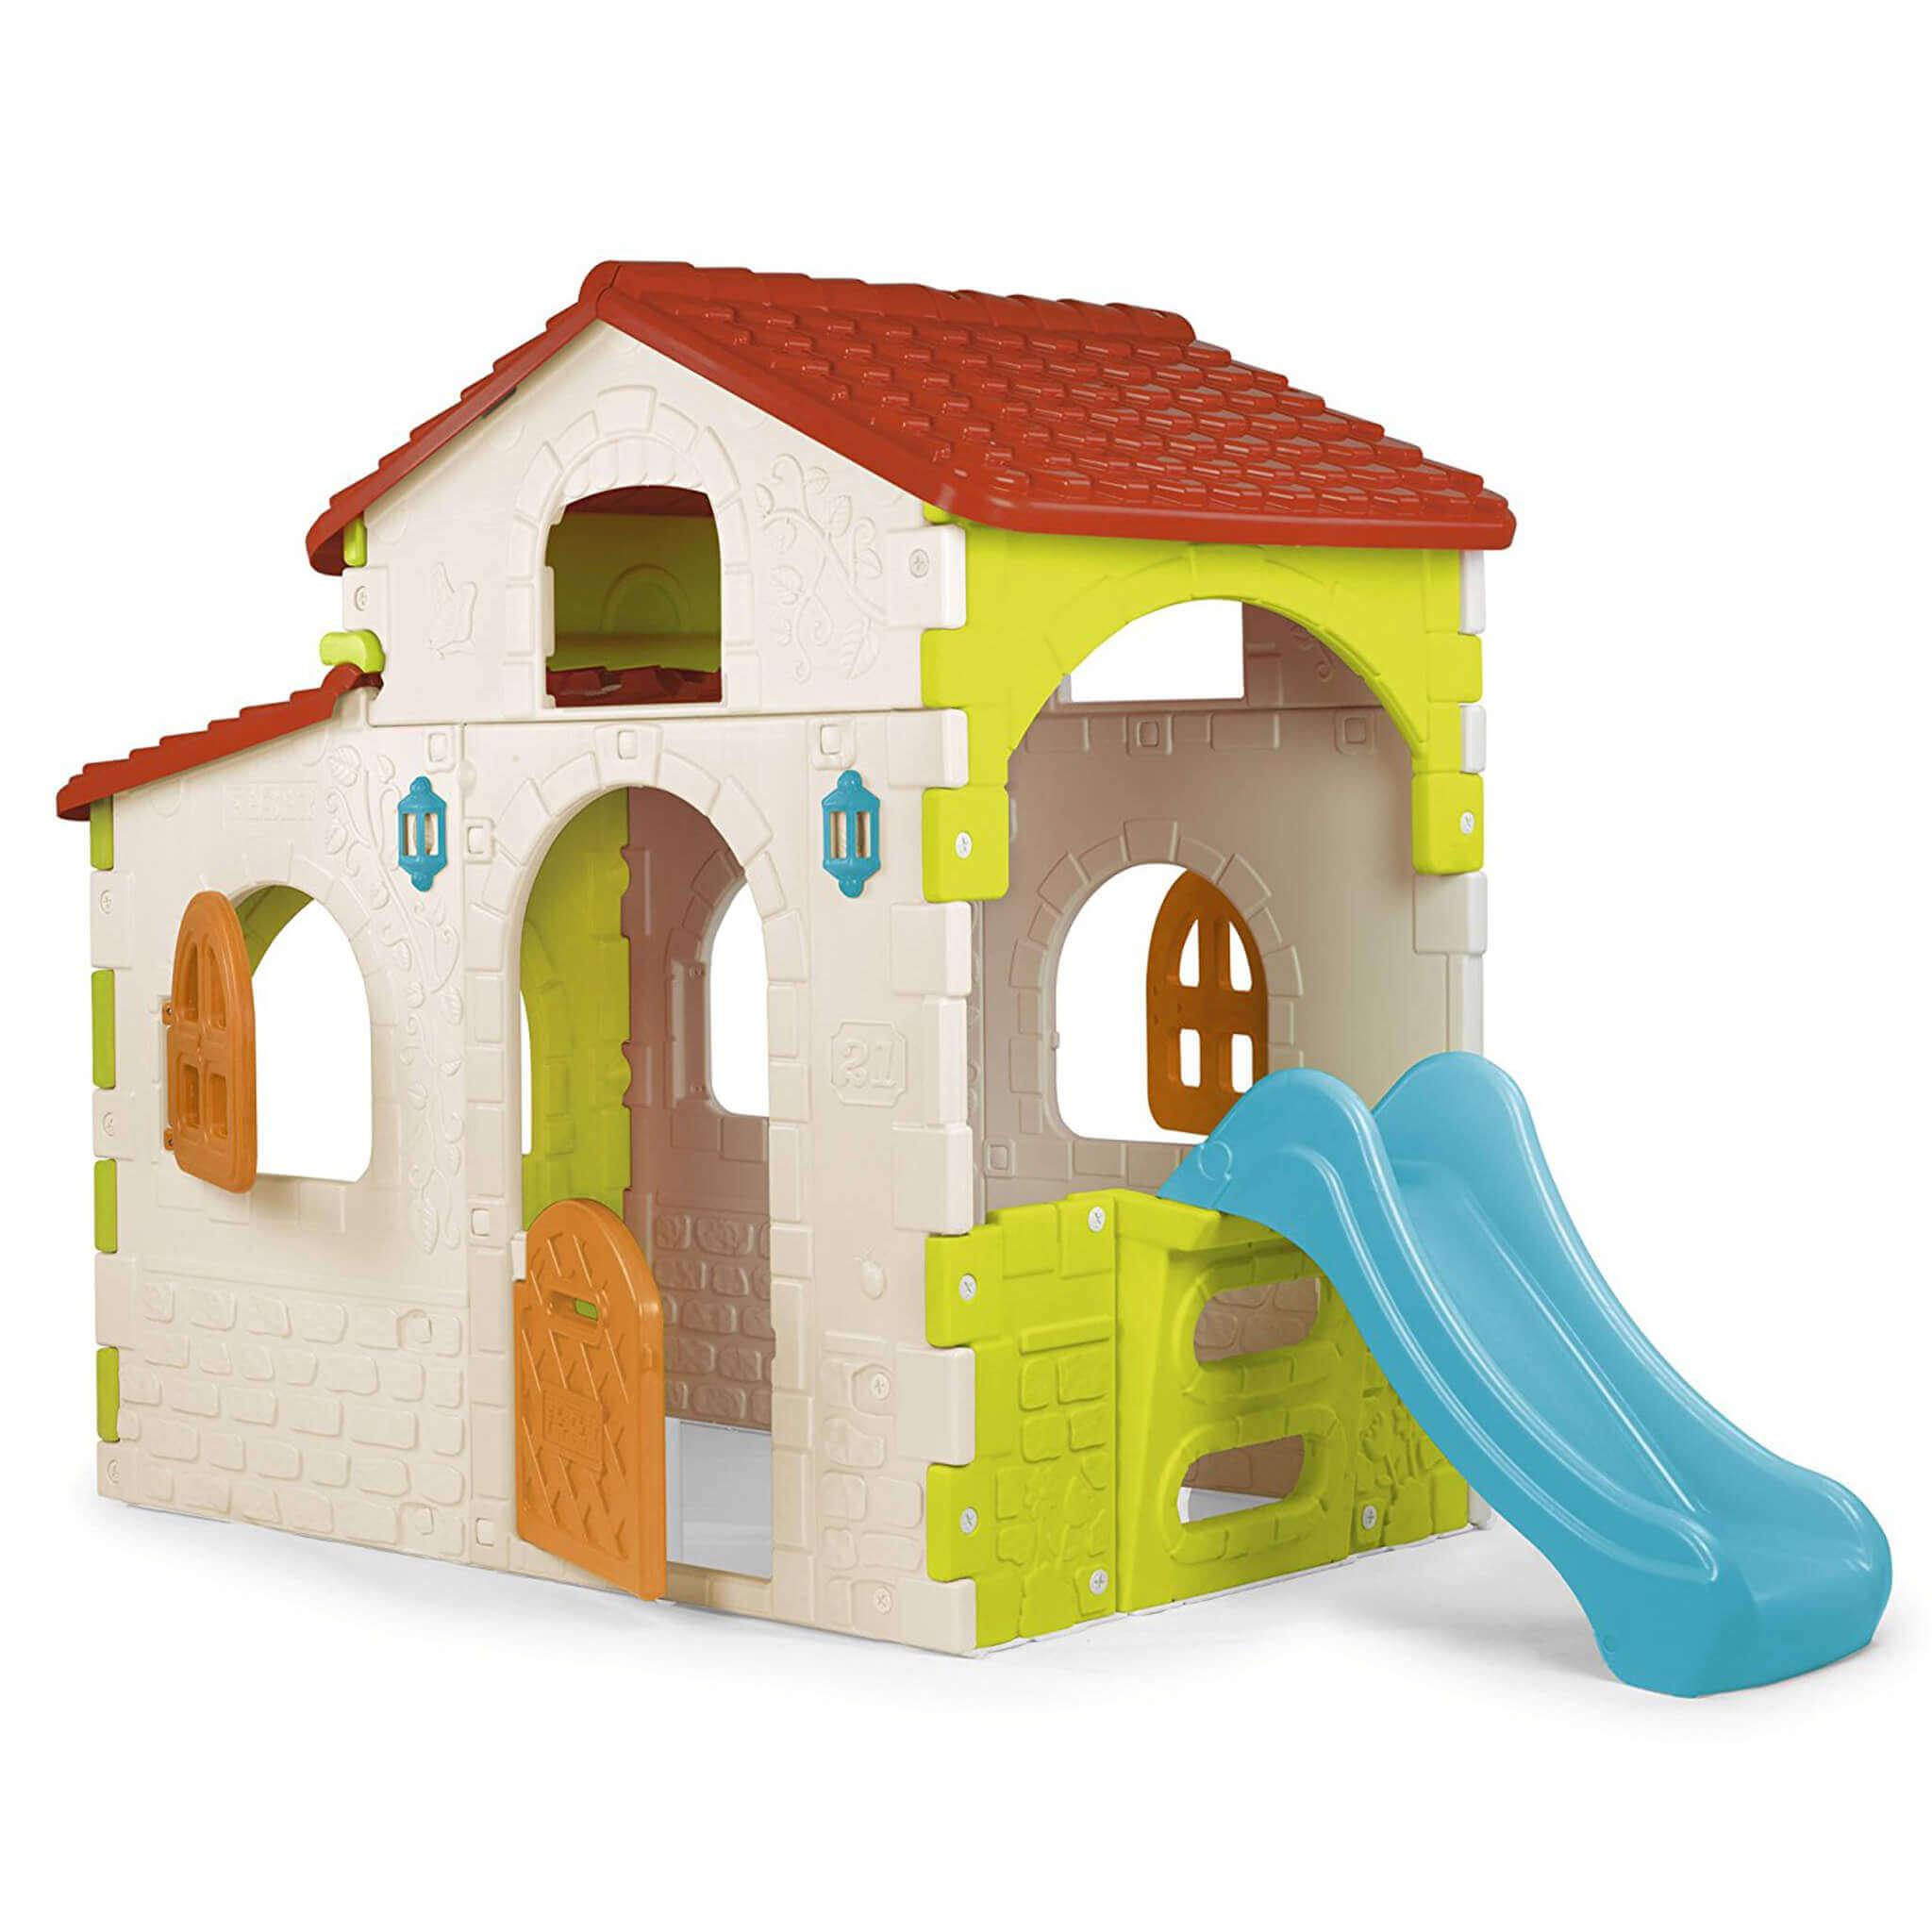 Milani Home BEAUTY - casetta da giardino per bambini